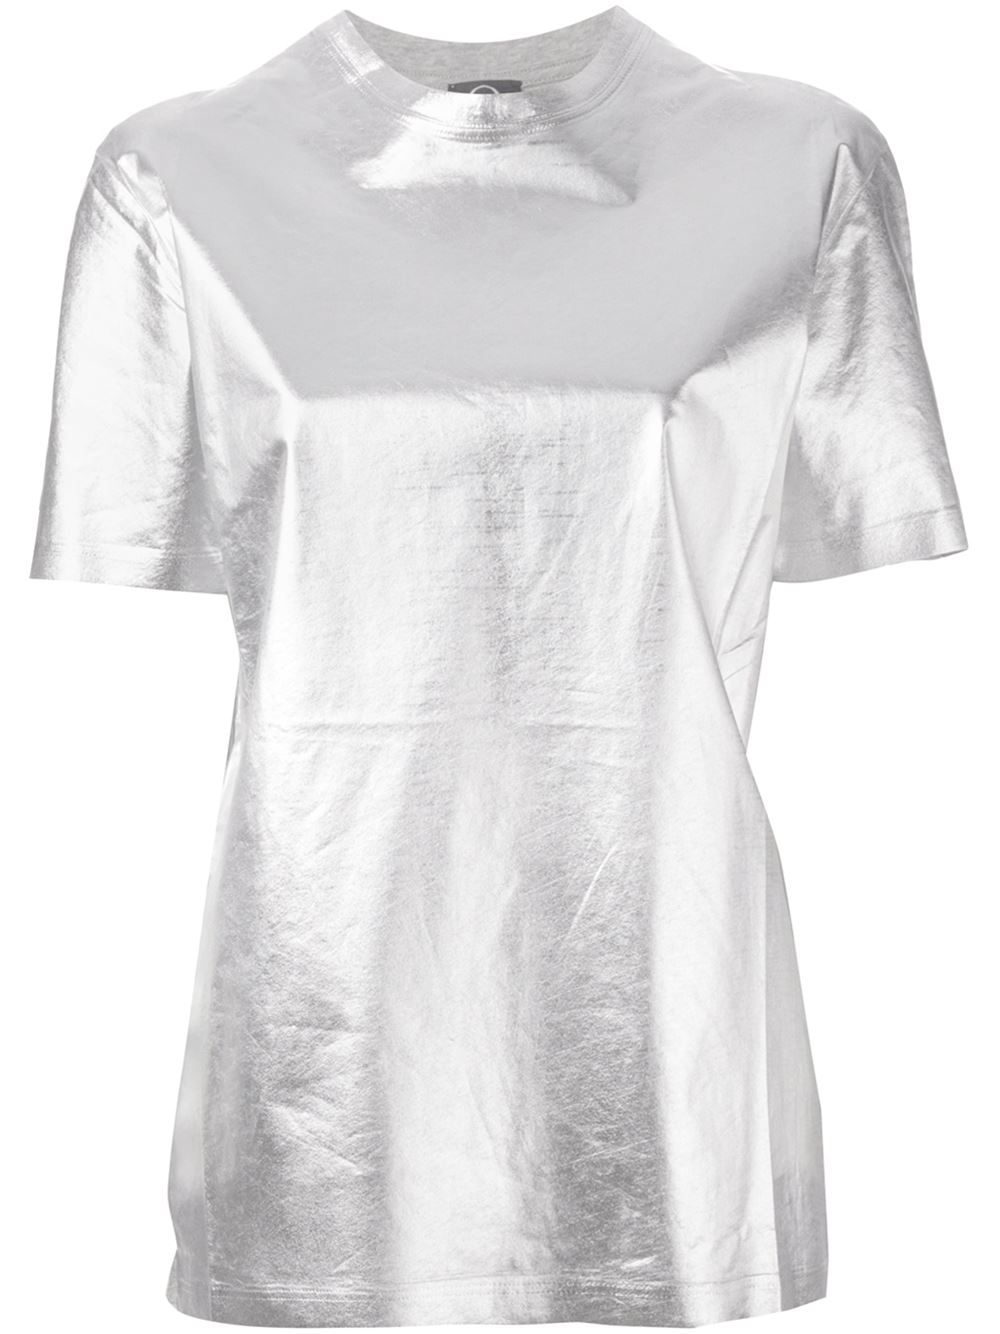 Mcq metallic panel t shirt in metallic lyst for Silver metallic shirt women s